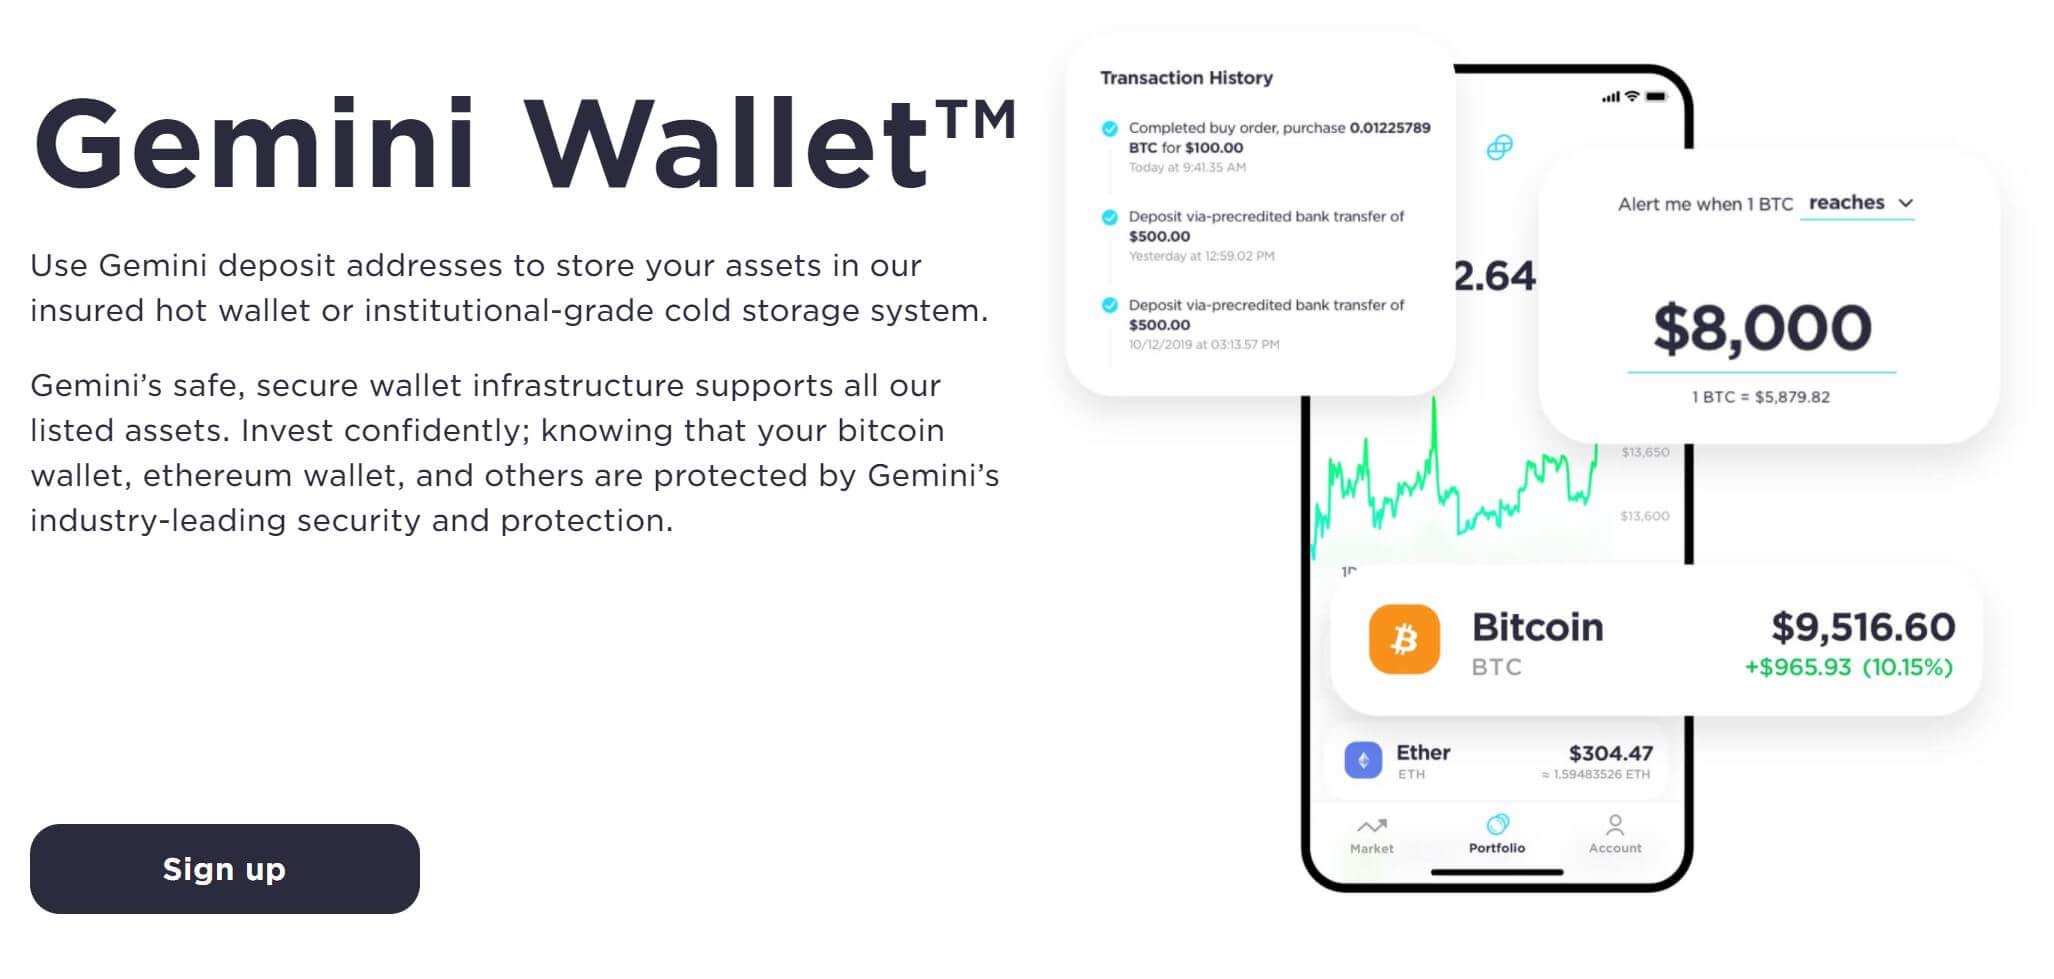 Gemini Wallet